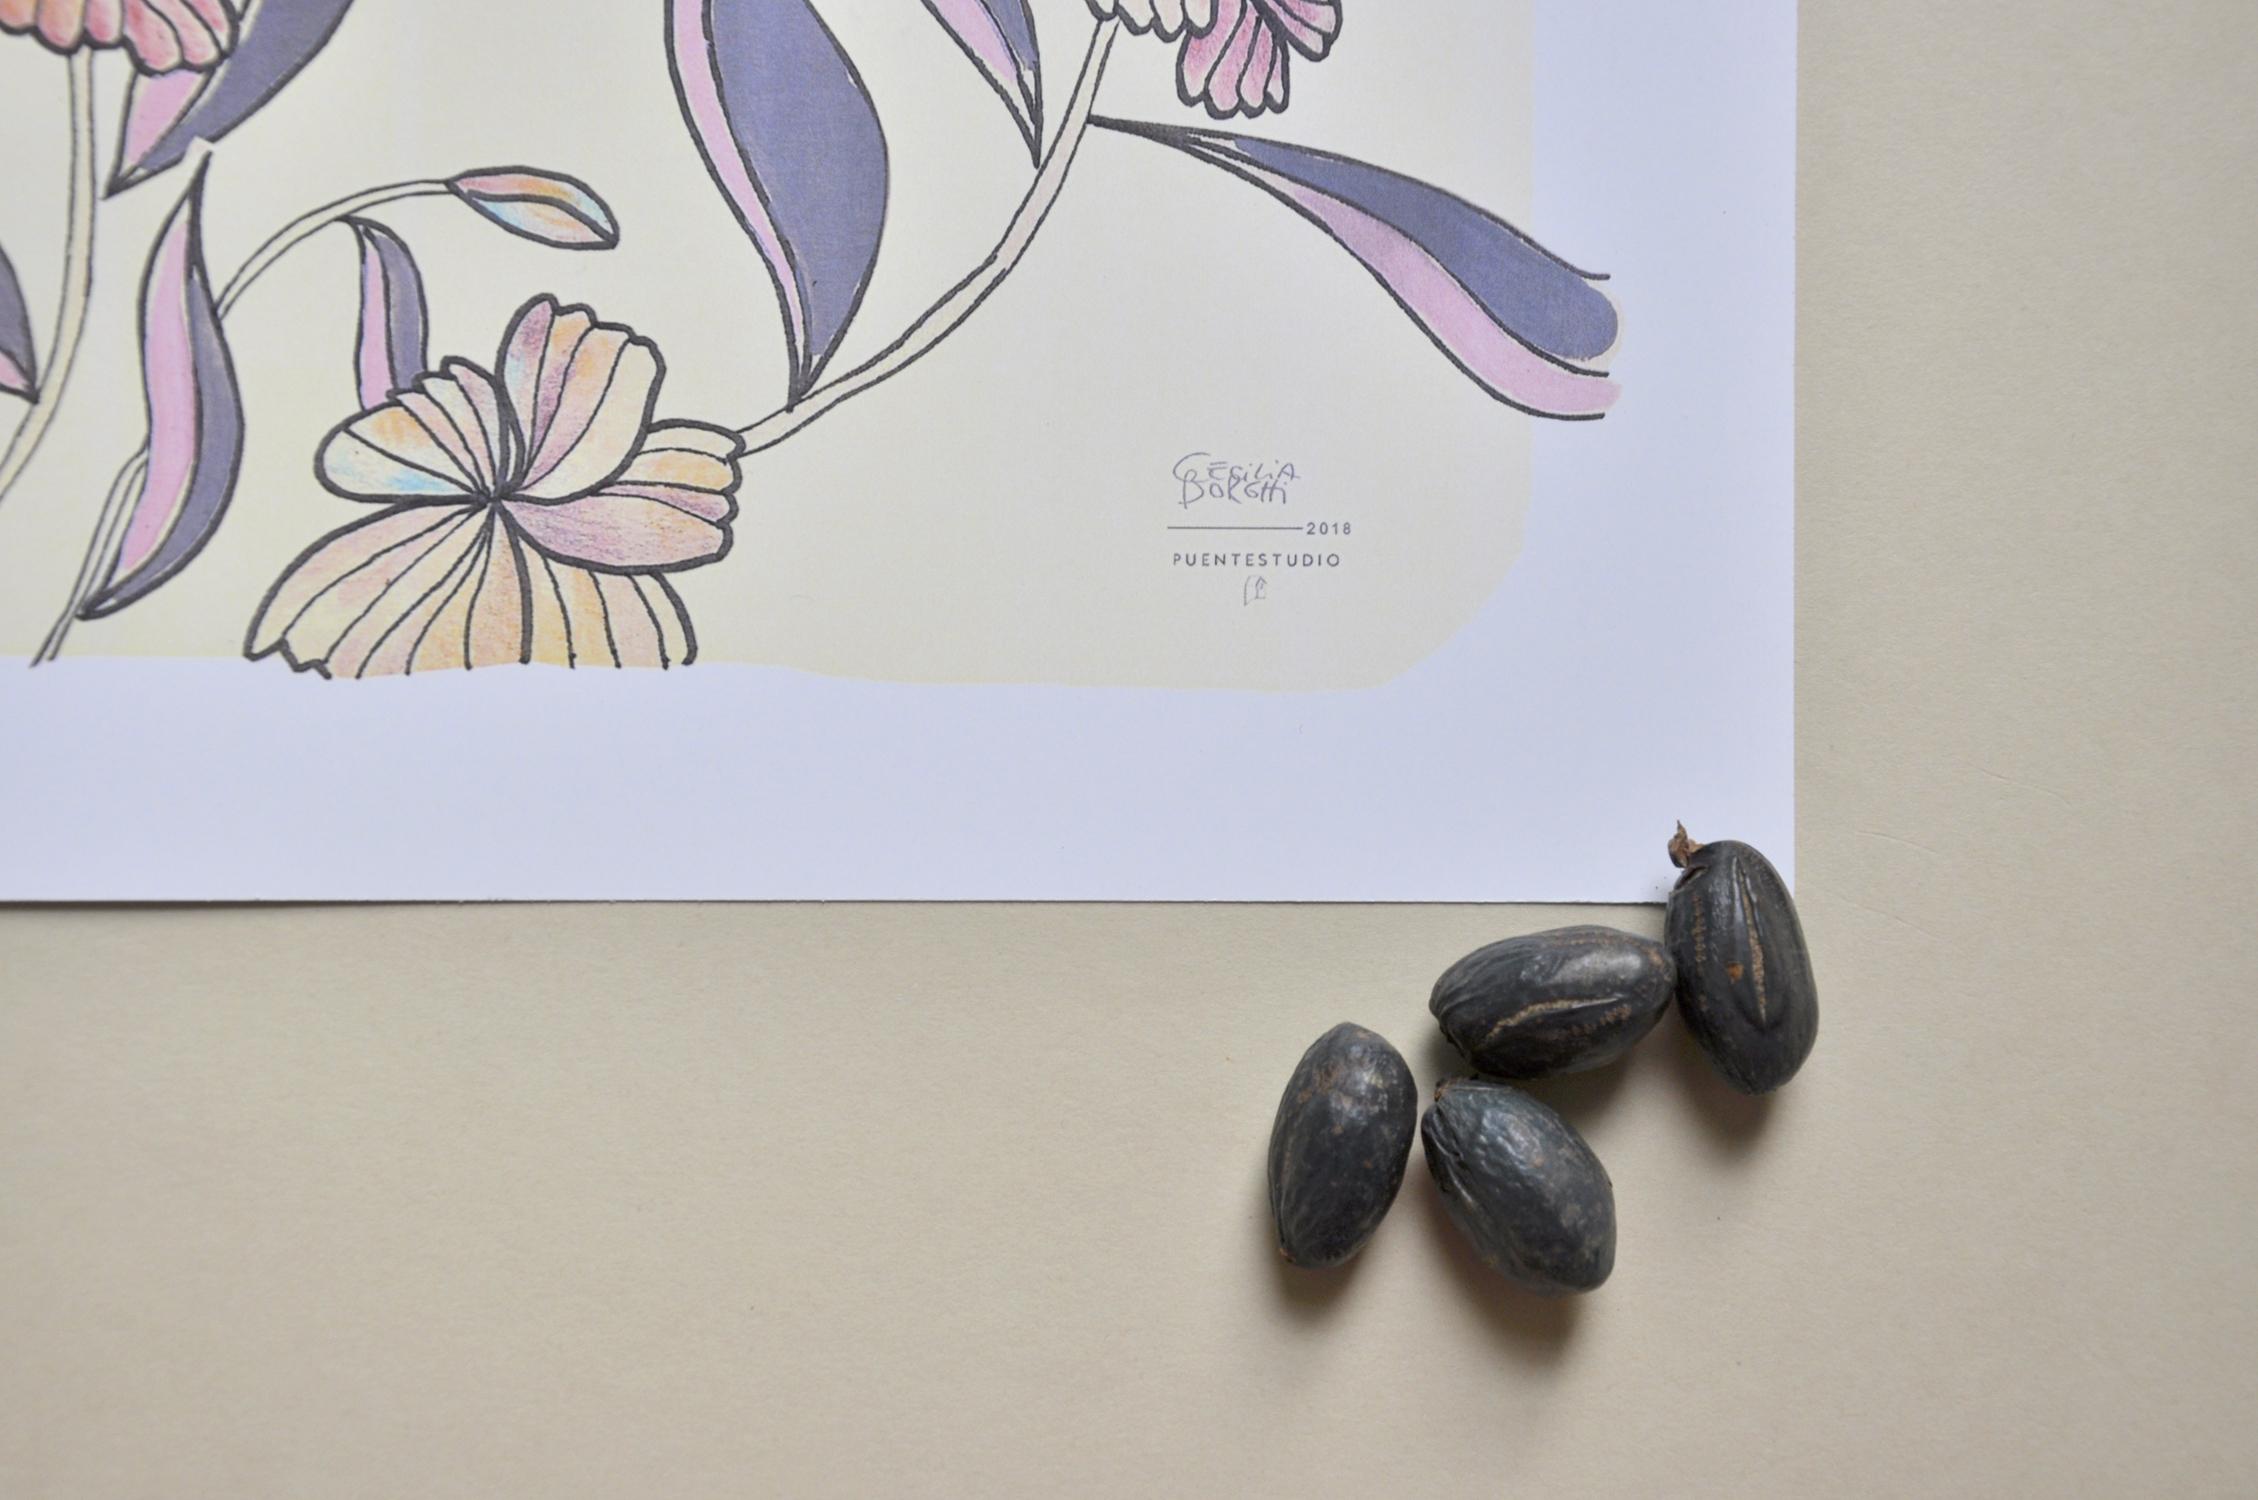 ceciliaborghi_puentestudio_magnolia5.jpg